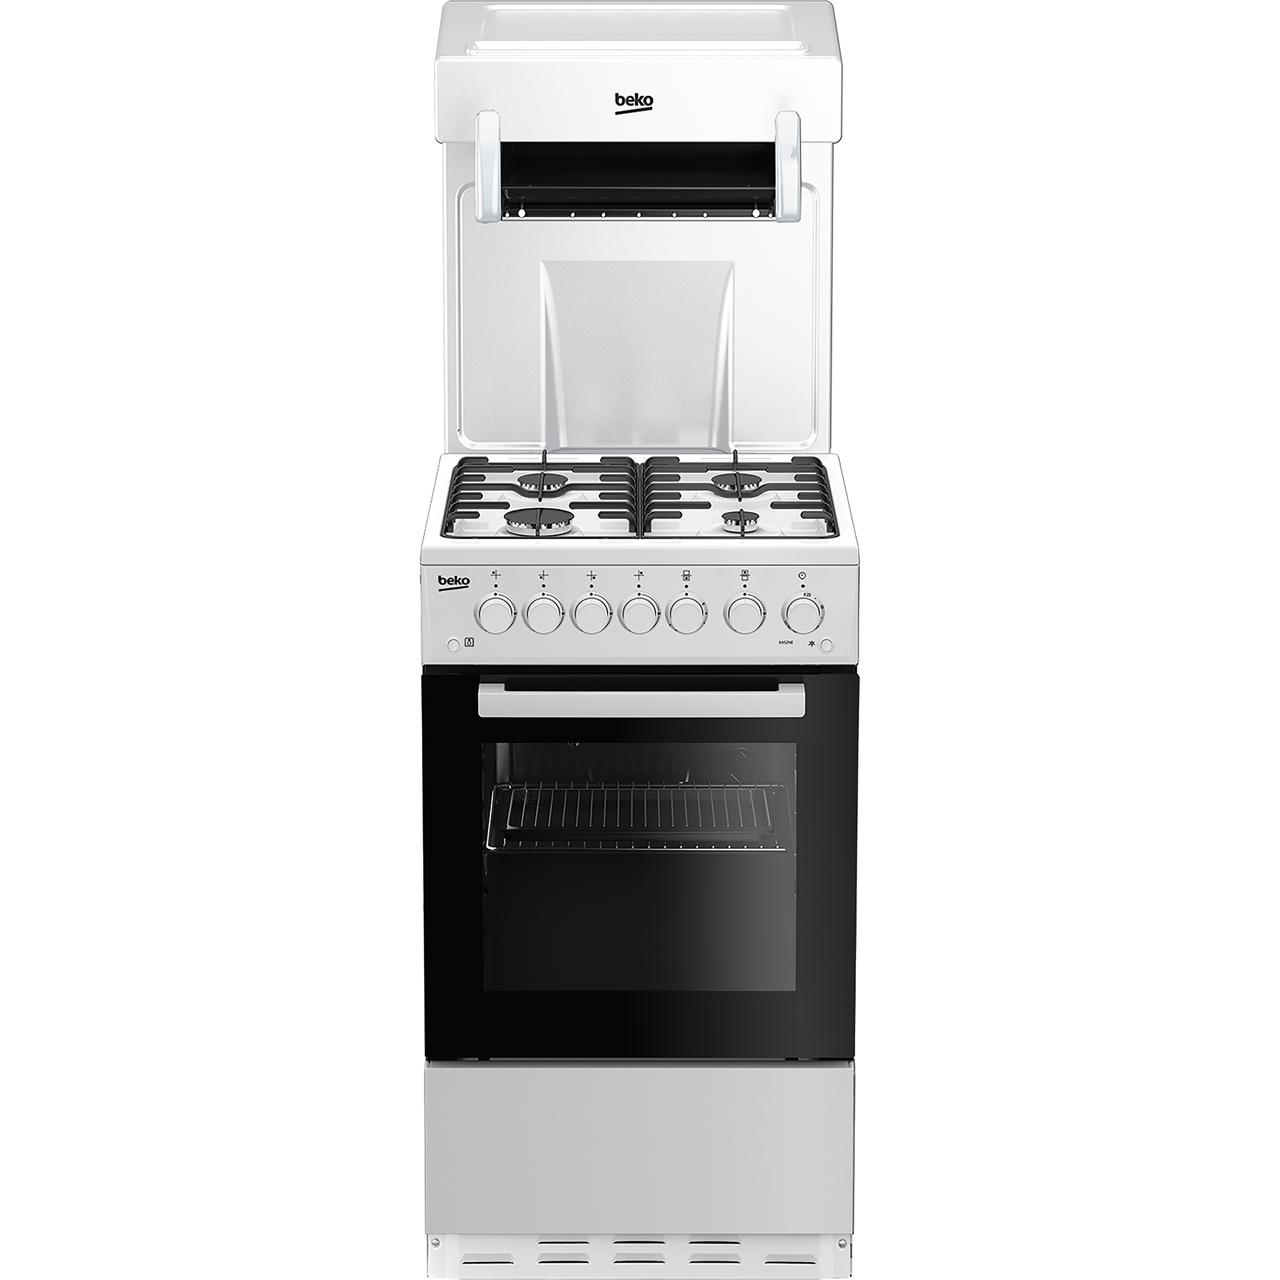 beko eye level gas cooker ka52new white. Black Bedroom Furniture Sets. Home Design Ideas